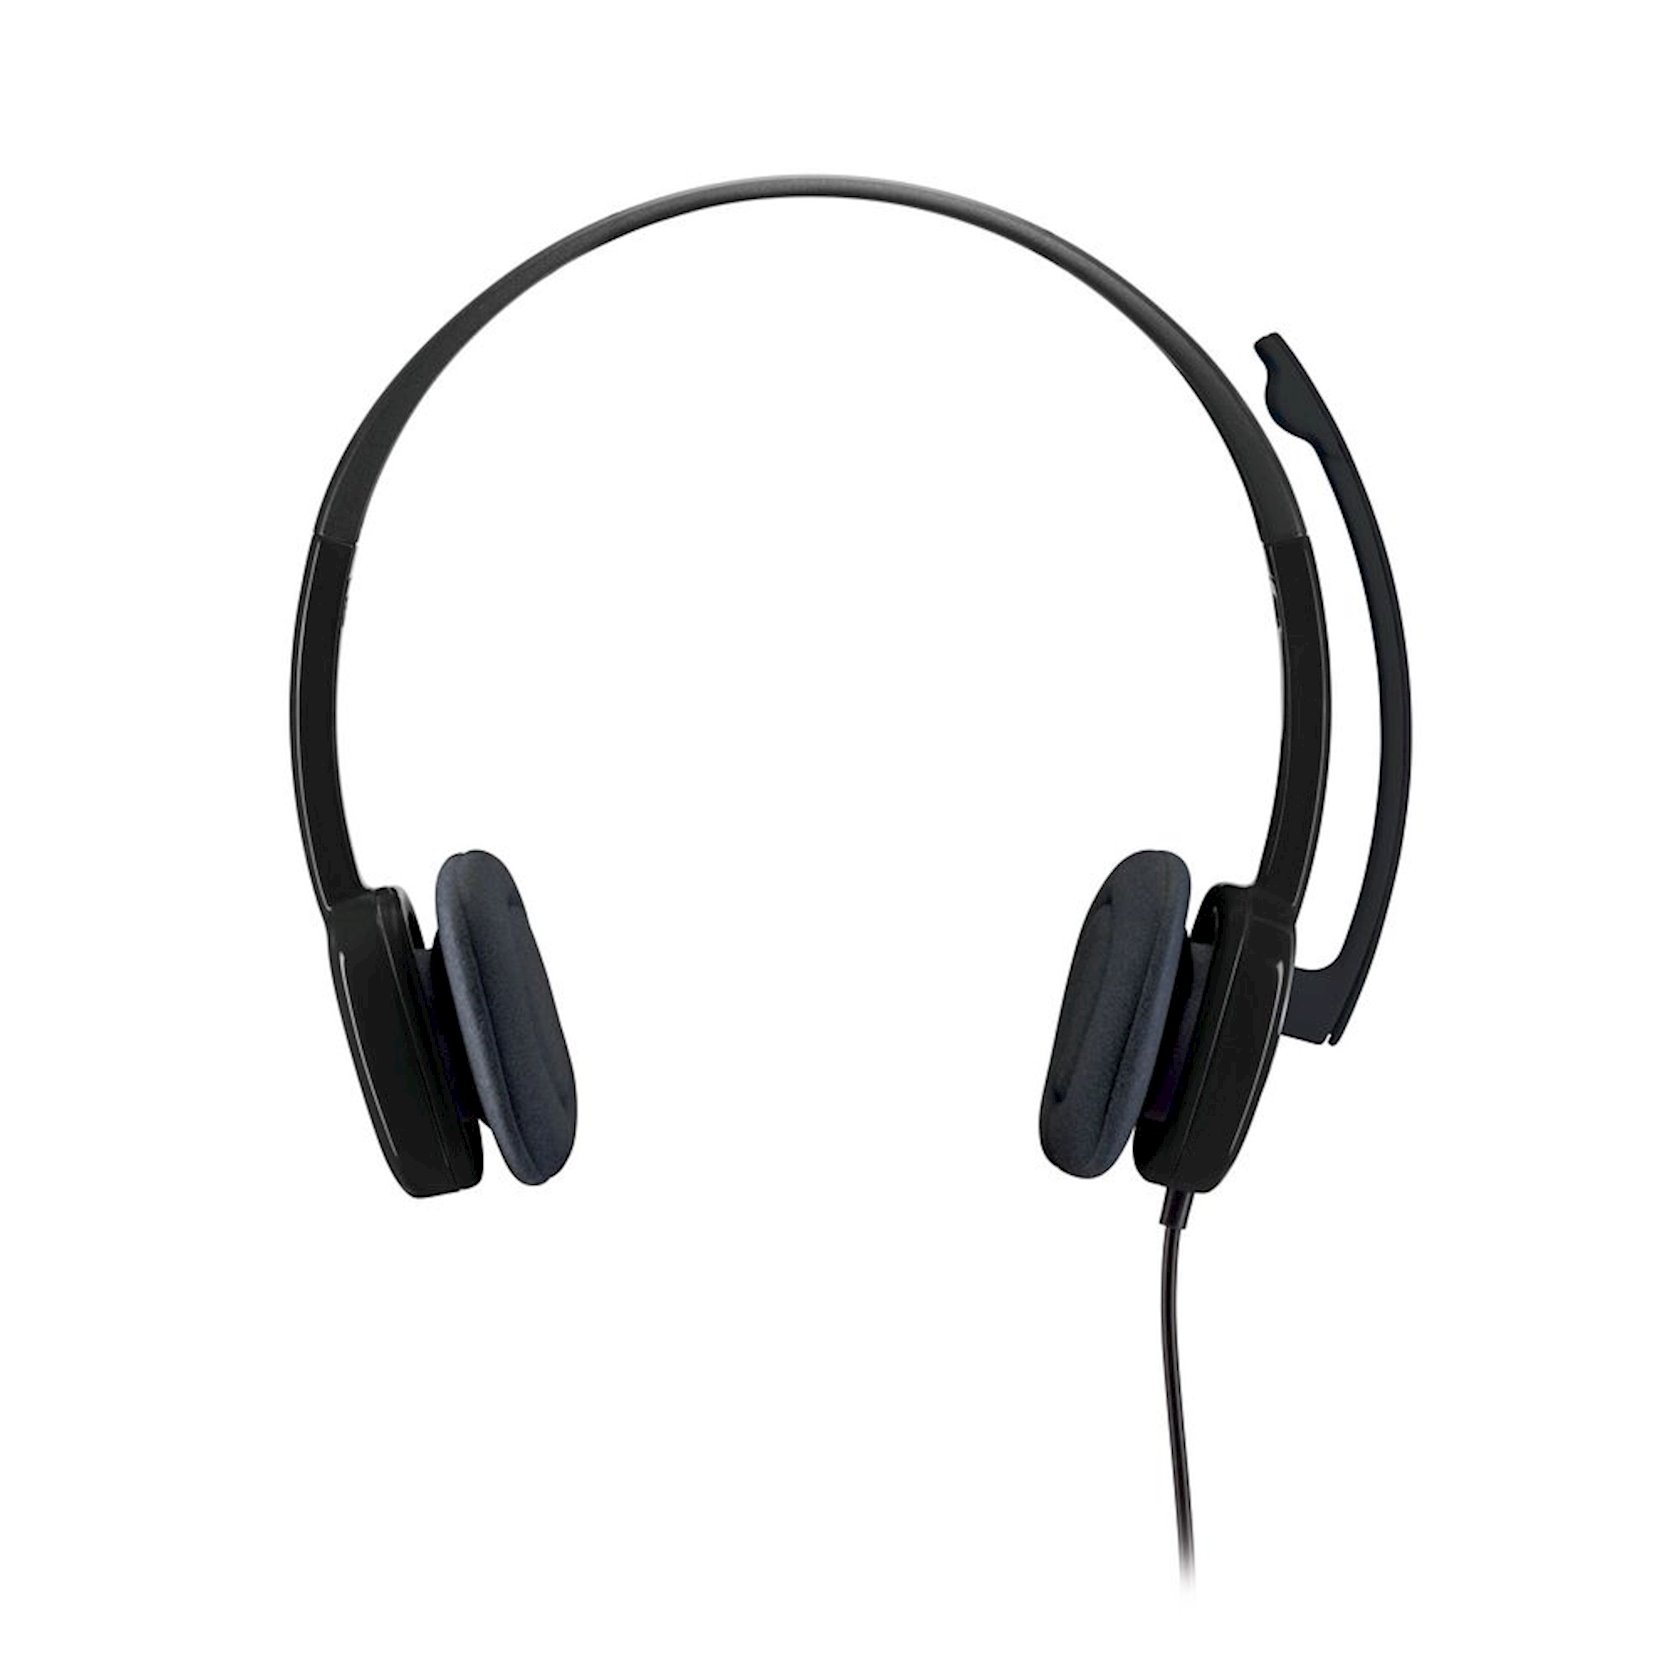 Qulaqlıq-qarnitur Logitech Stereo Headset H151 981-000589 Black